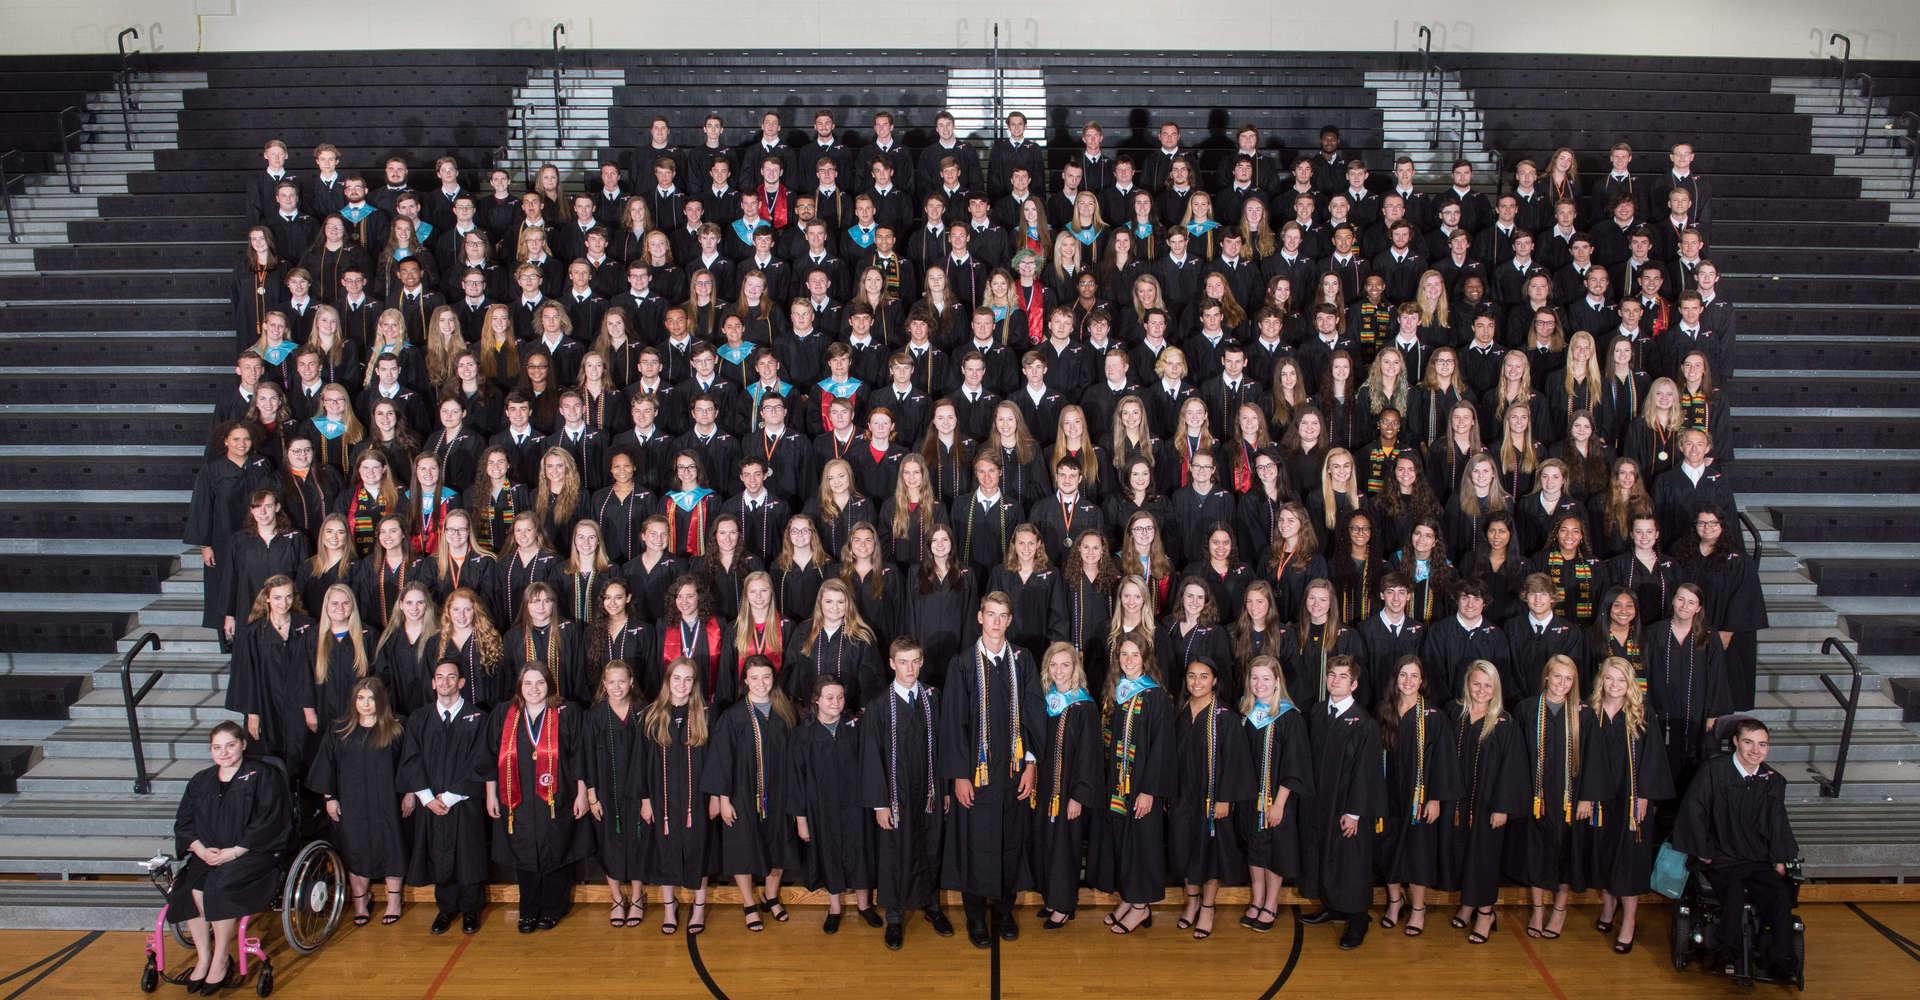 Powhatan High School 2018-2019 Graduates